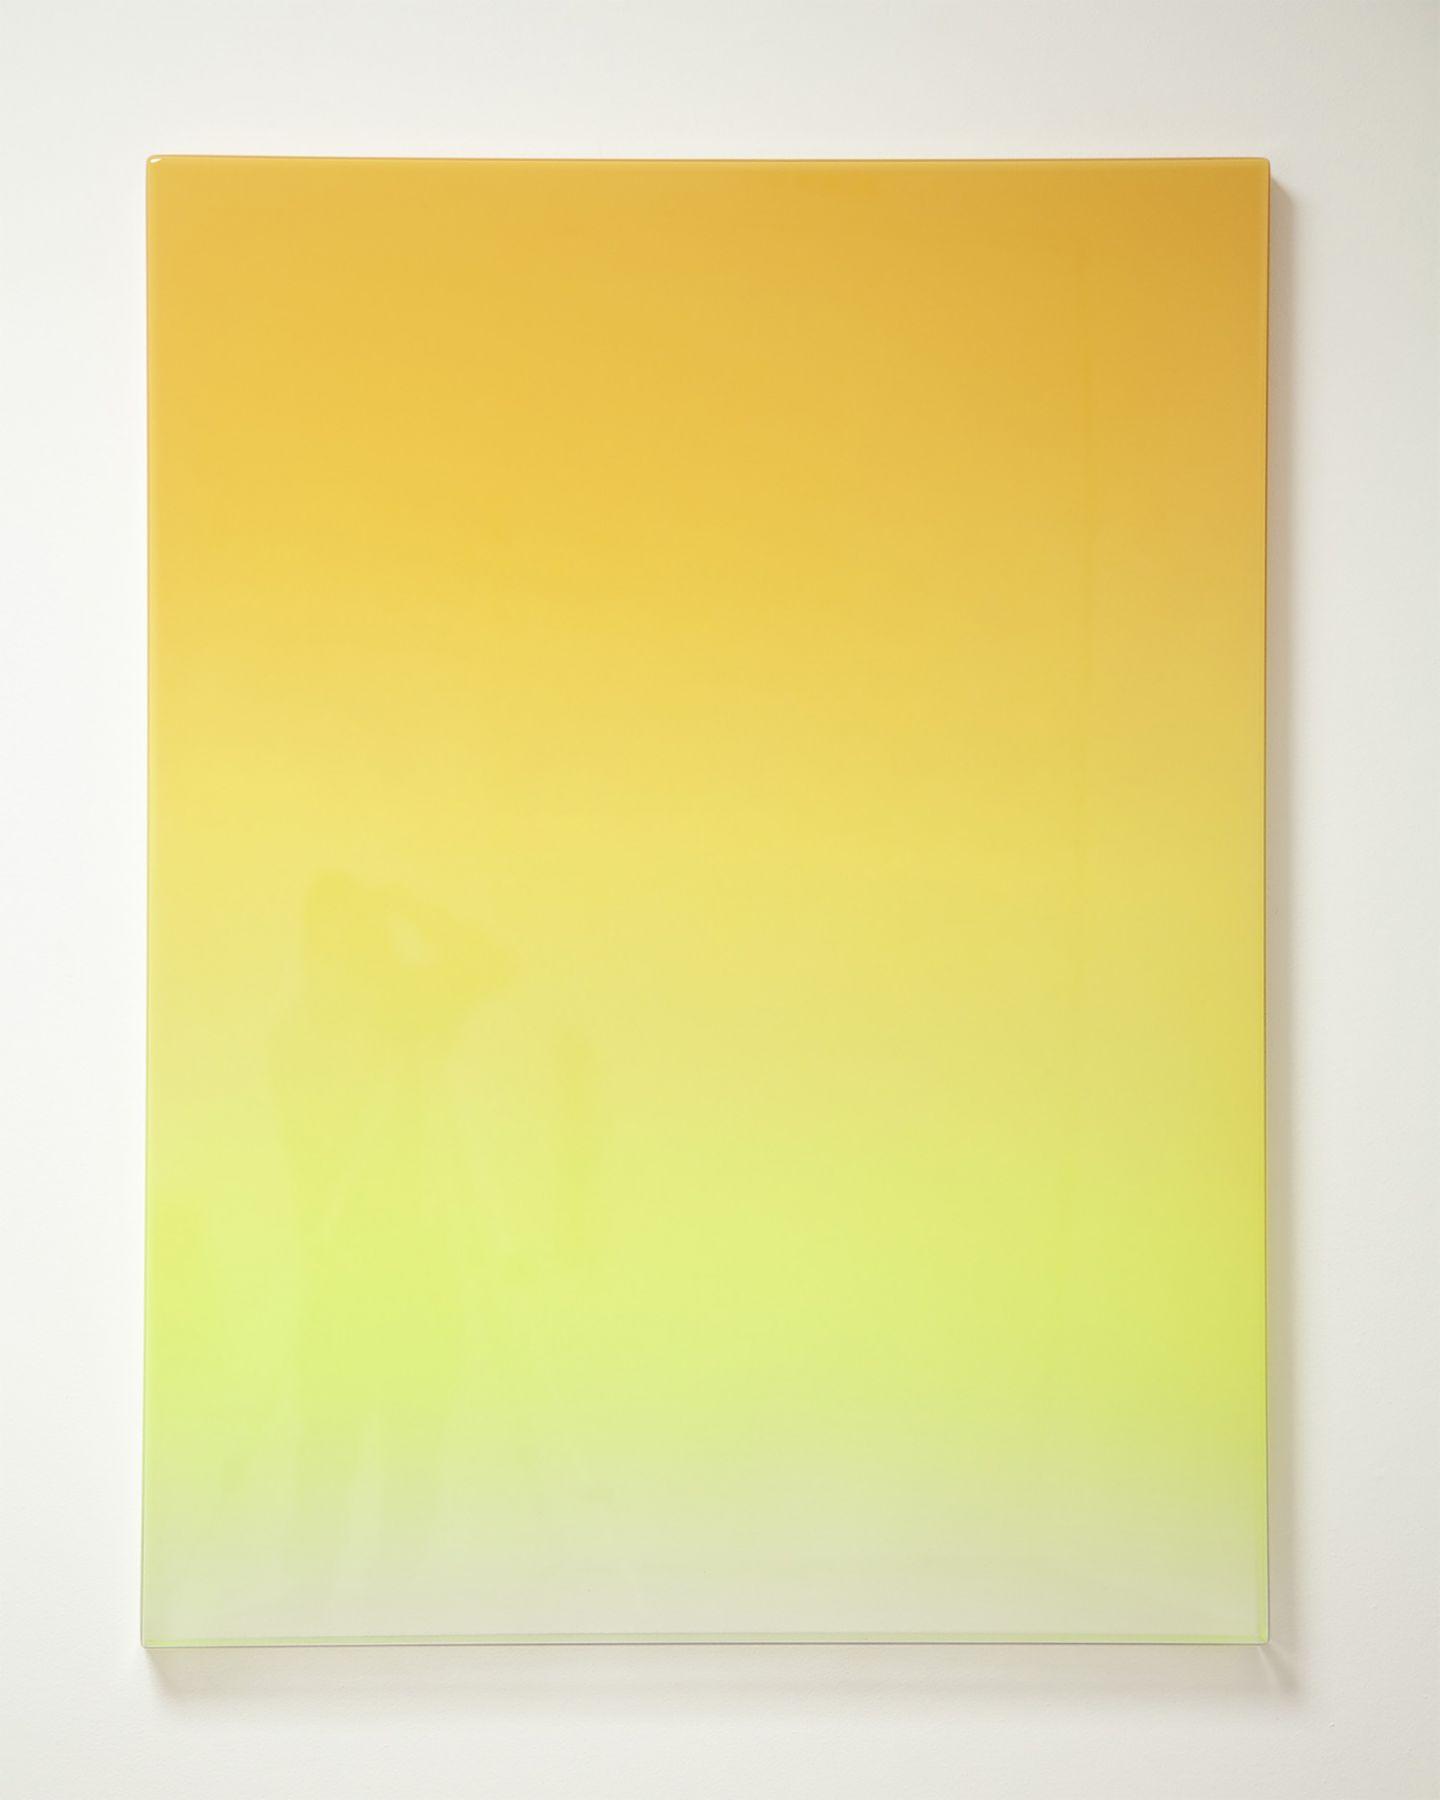 Mika Tajima Art d'Ameublement (Kolmanskop), 2018